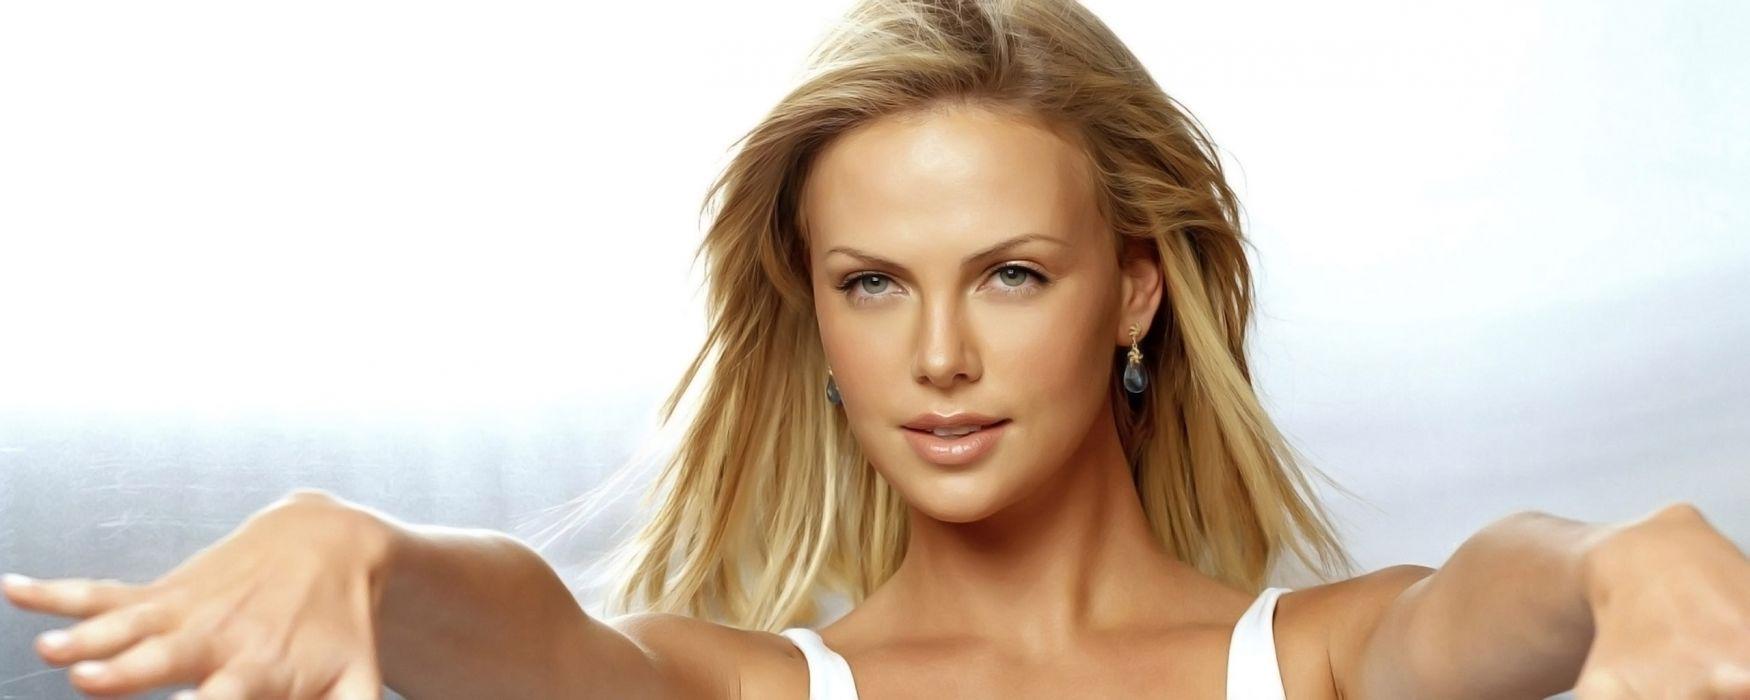 women models Charlize Theron wallpaper